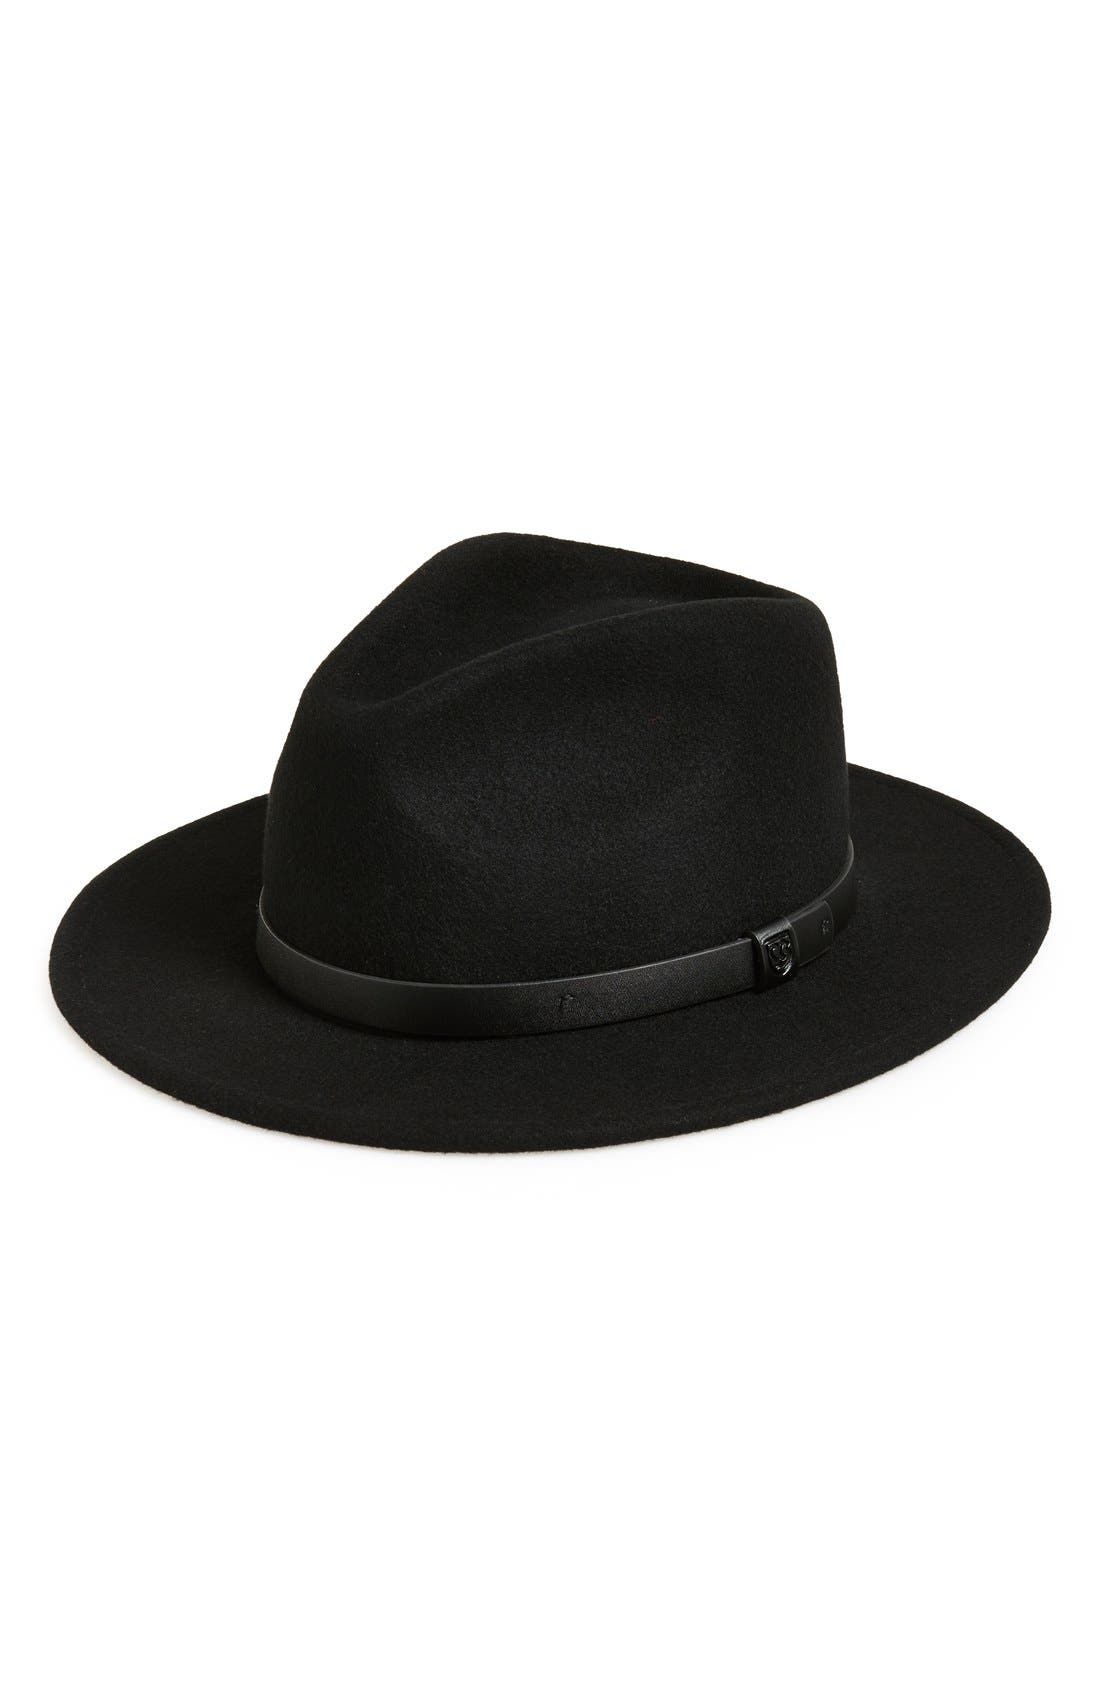 'Messer' Fedora,                         Main,                         color, Black/Black